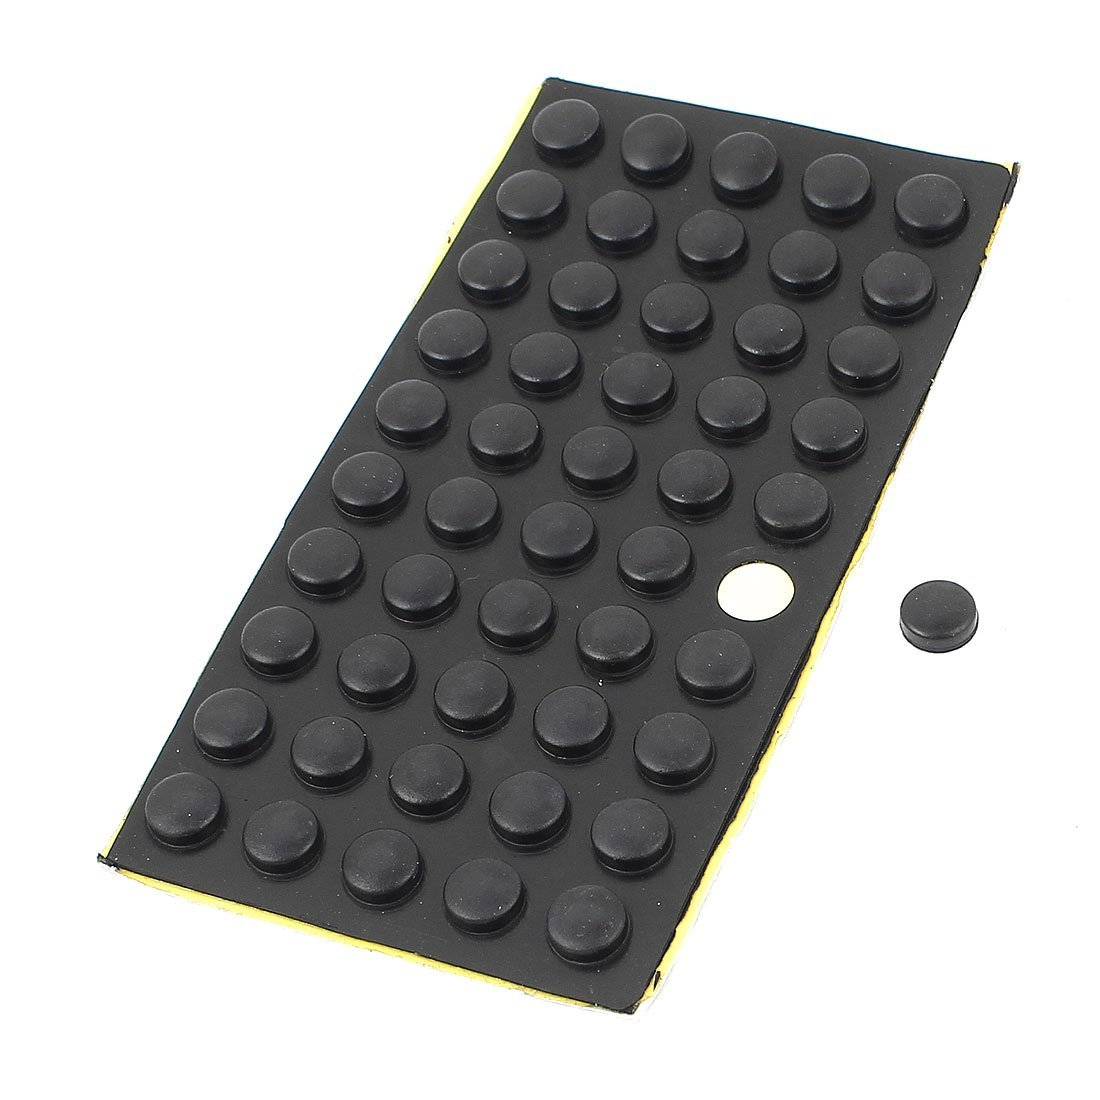 DealMux Inicio de Mesa Piso Adhesiva de 10 mm x 4 mm Mini Tacos de Goma Negro 50 PC